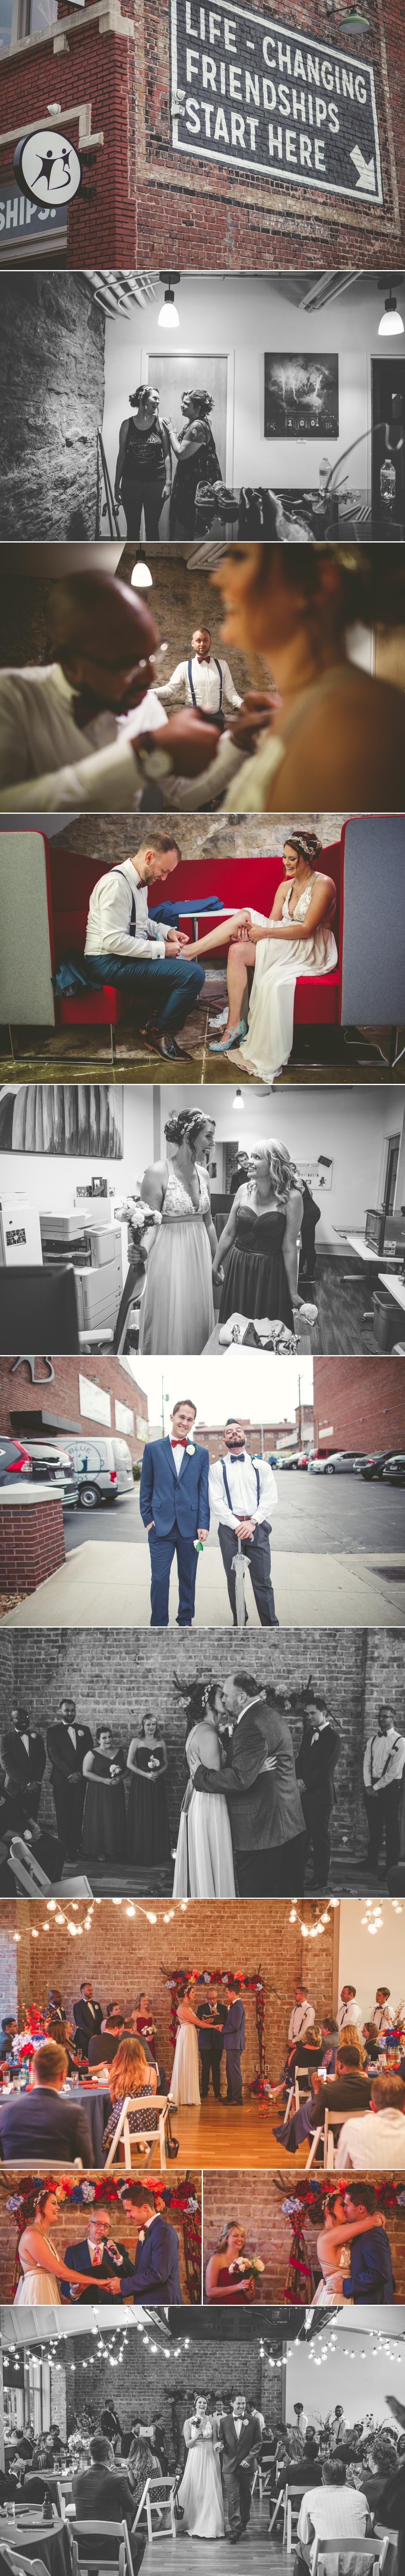 jason_domingues_photography_best_kansas_city_wedding_photographer_kc_weddings_big_brothers_big_sisters_0001.JPG